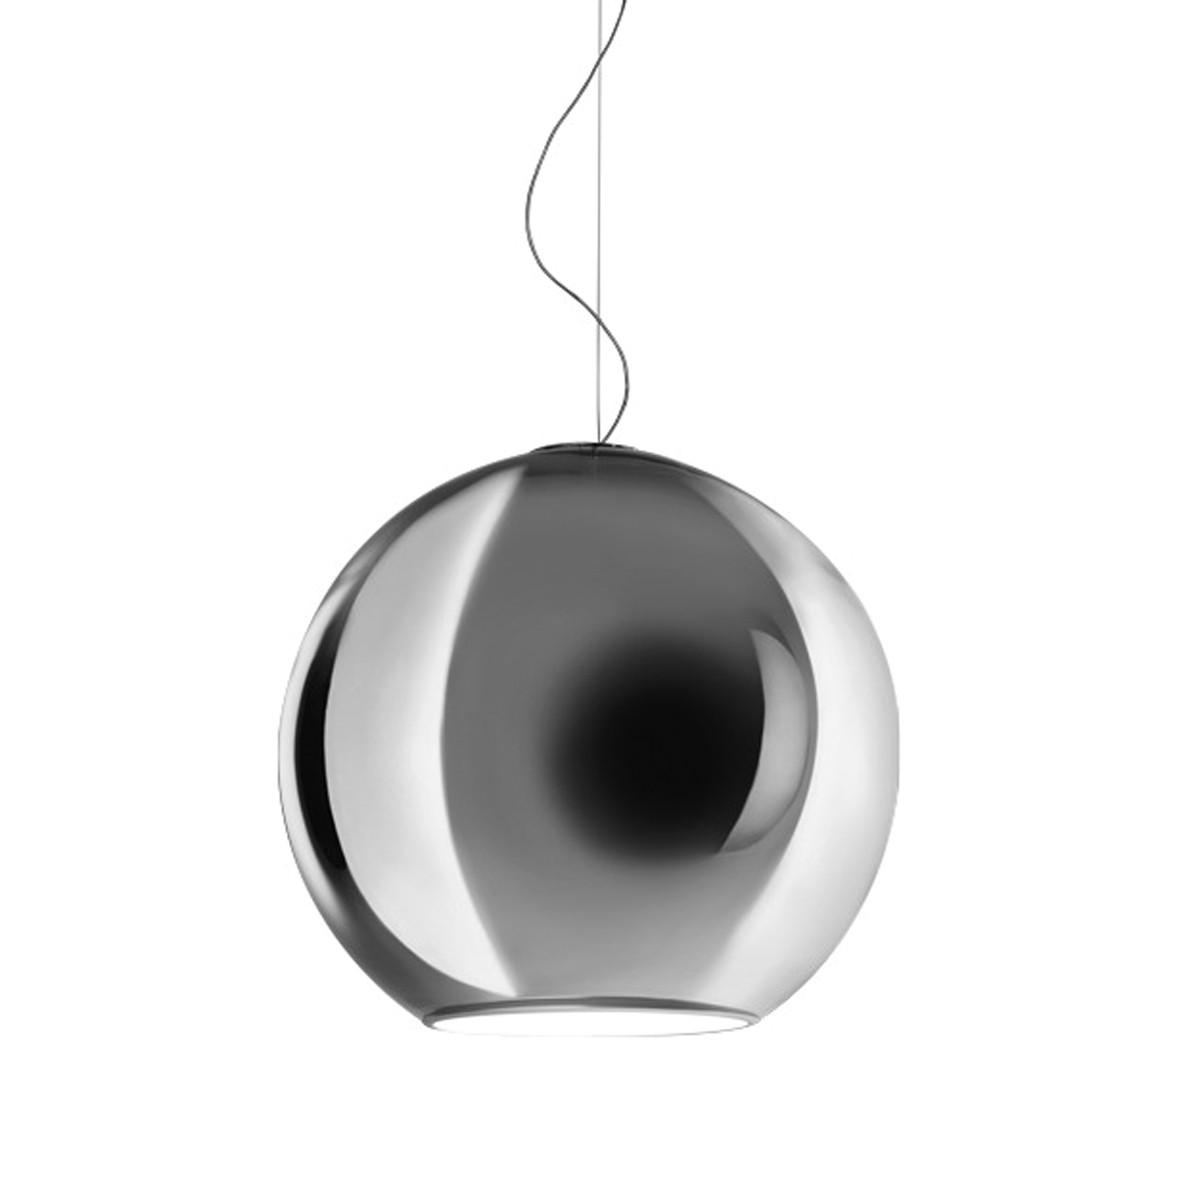 Fontana Arte Globo Di Luce Pendelleuchte, Ø: 20 cm, Silber metallisiert